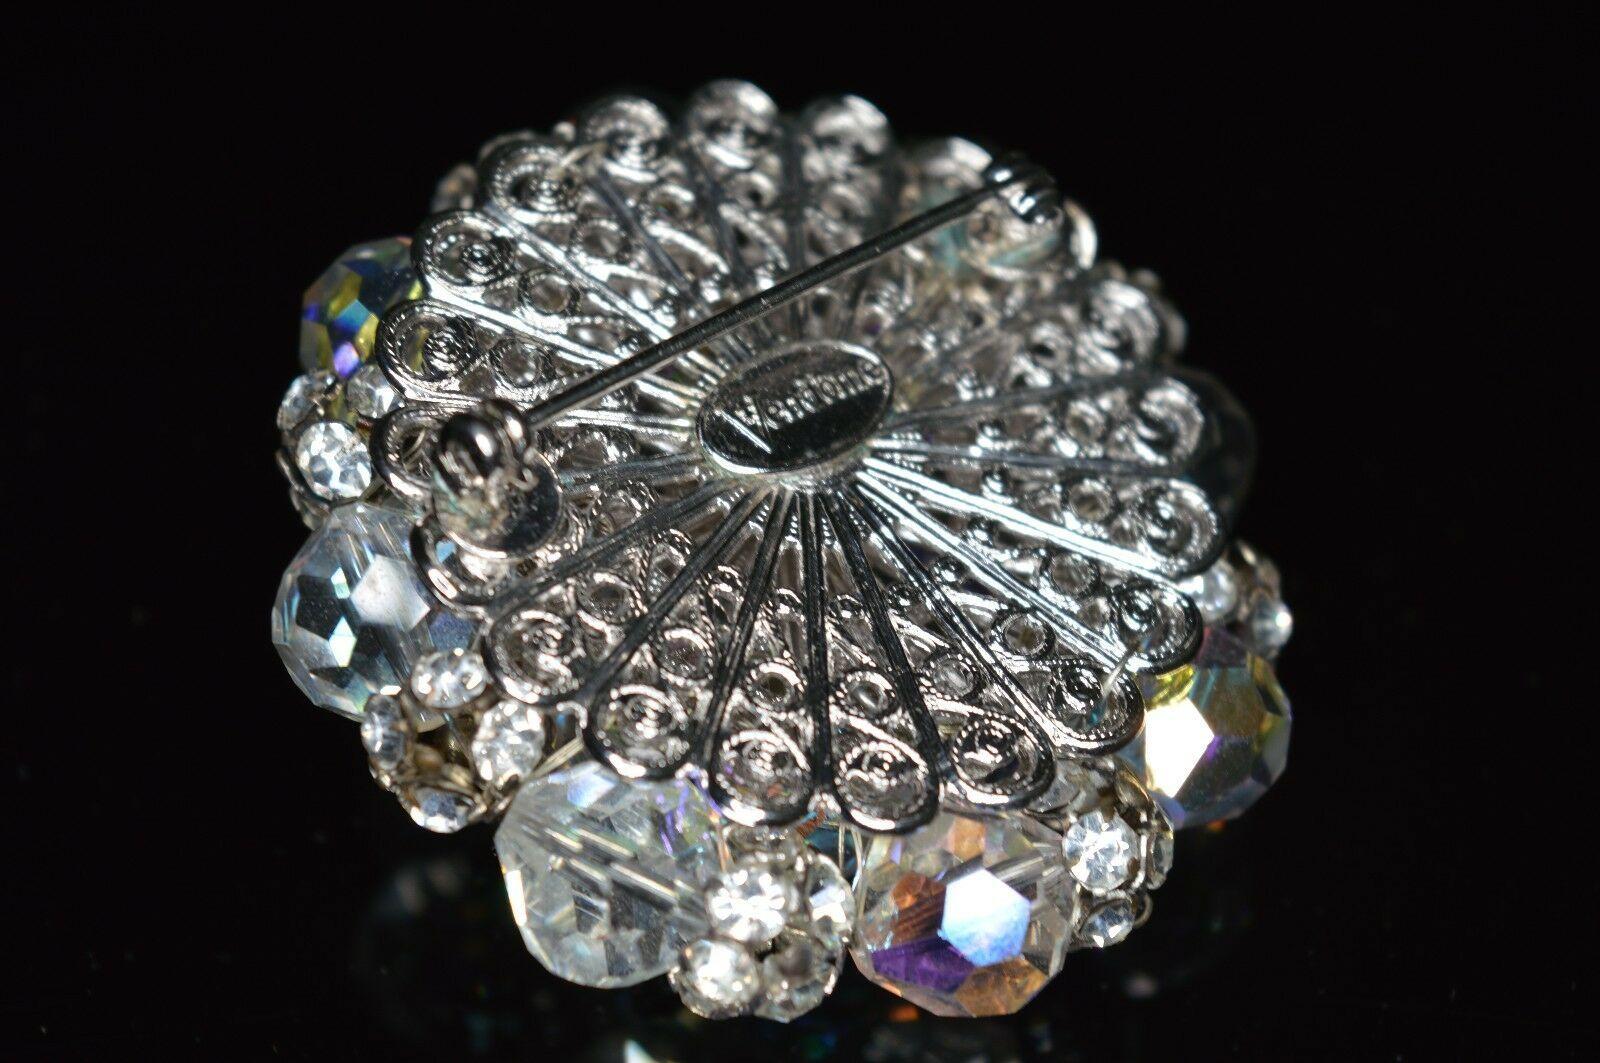 VTG RARE VENDOME Silver Tone Clear Crystal AB Rhinestone Brooch Pin